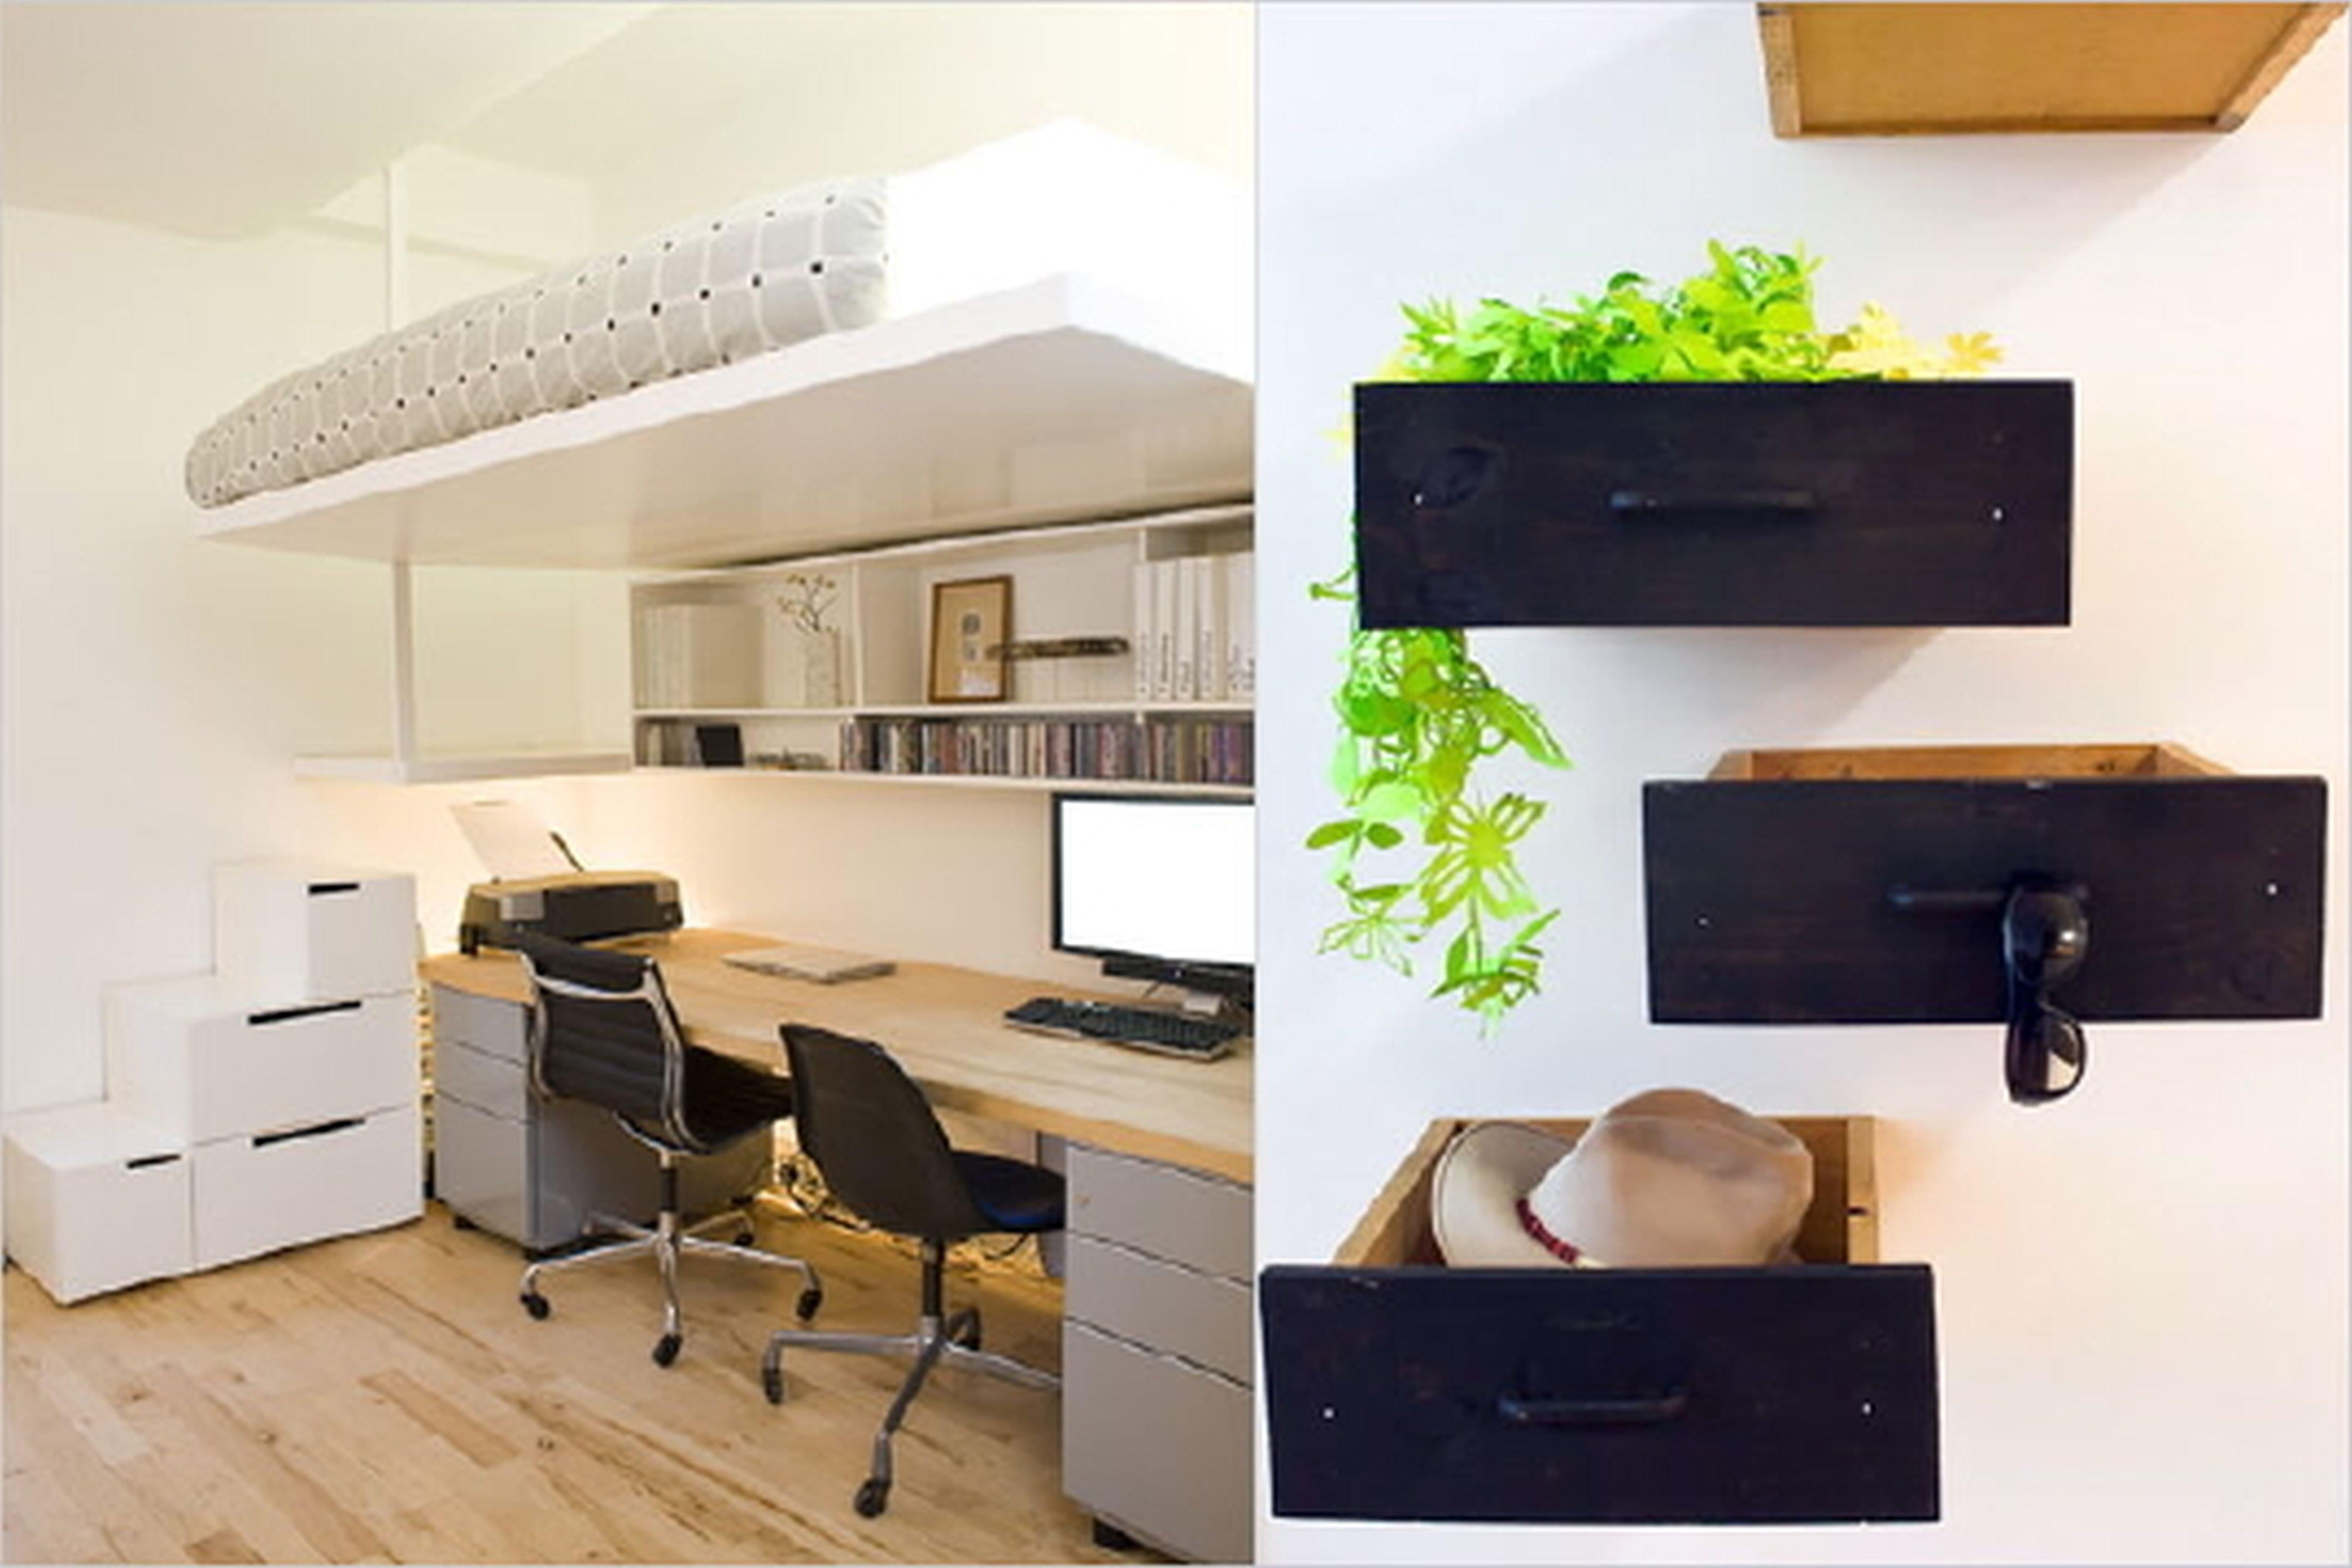 10 Most Popular Diy Decorating Ideas For Apartments popular diy home decor ideas living room decordiy decorating 2020